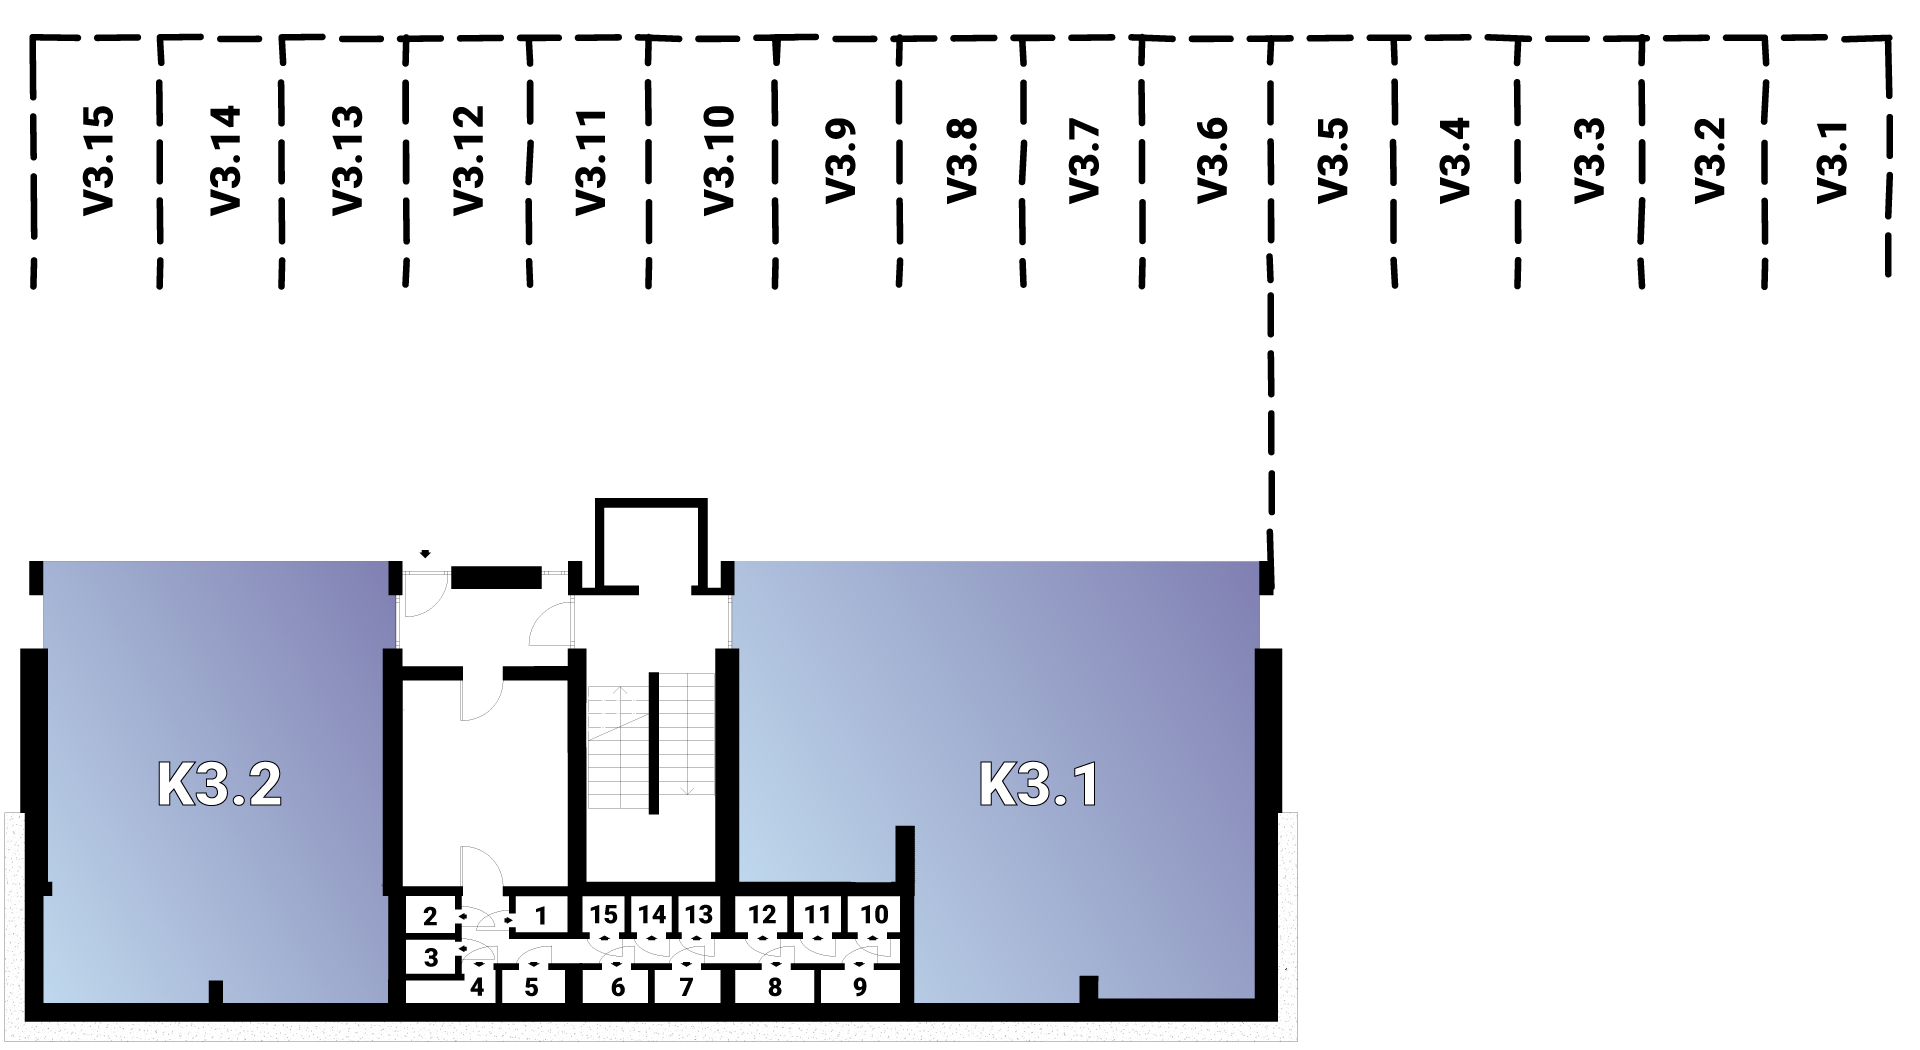 Klinovec-APTC-ALL-v4.2-PP.png